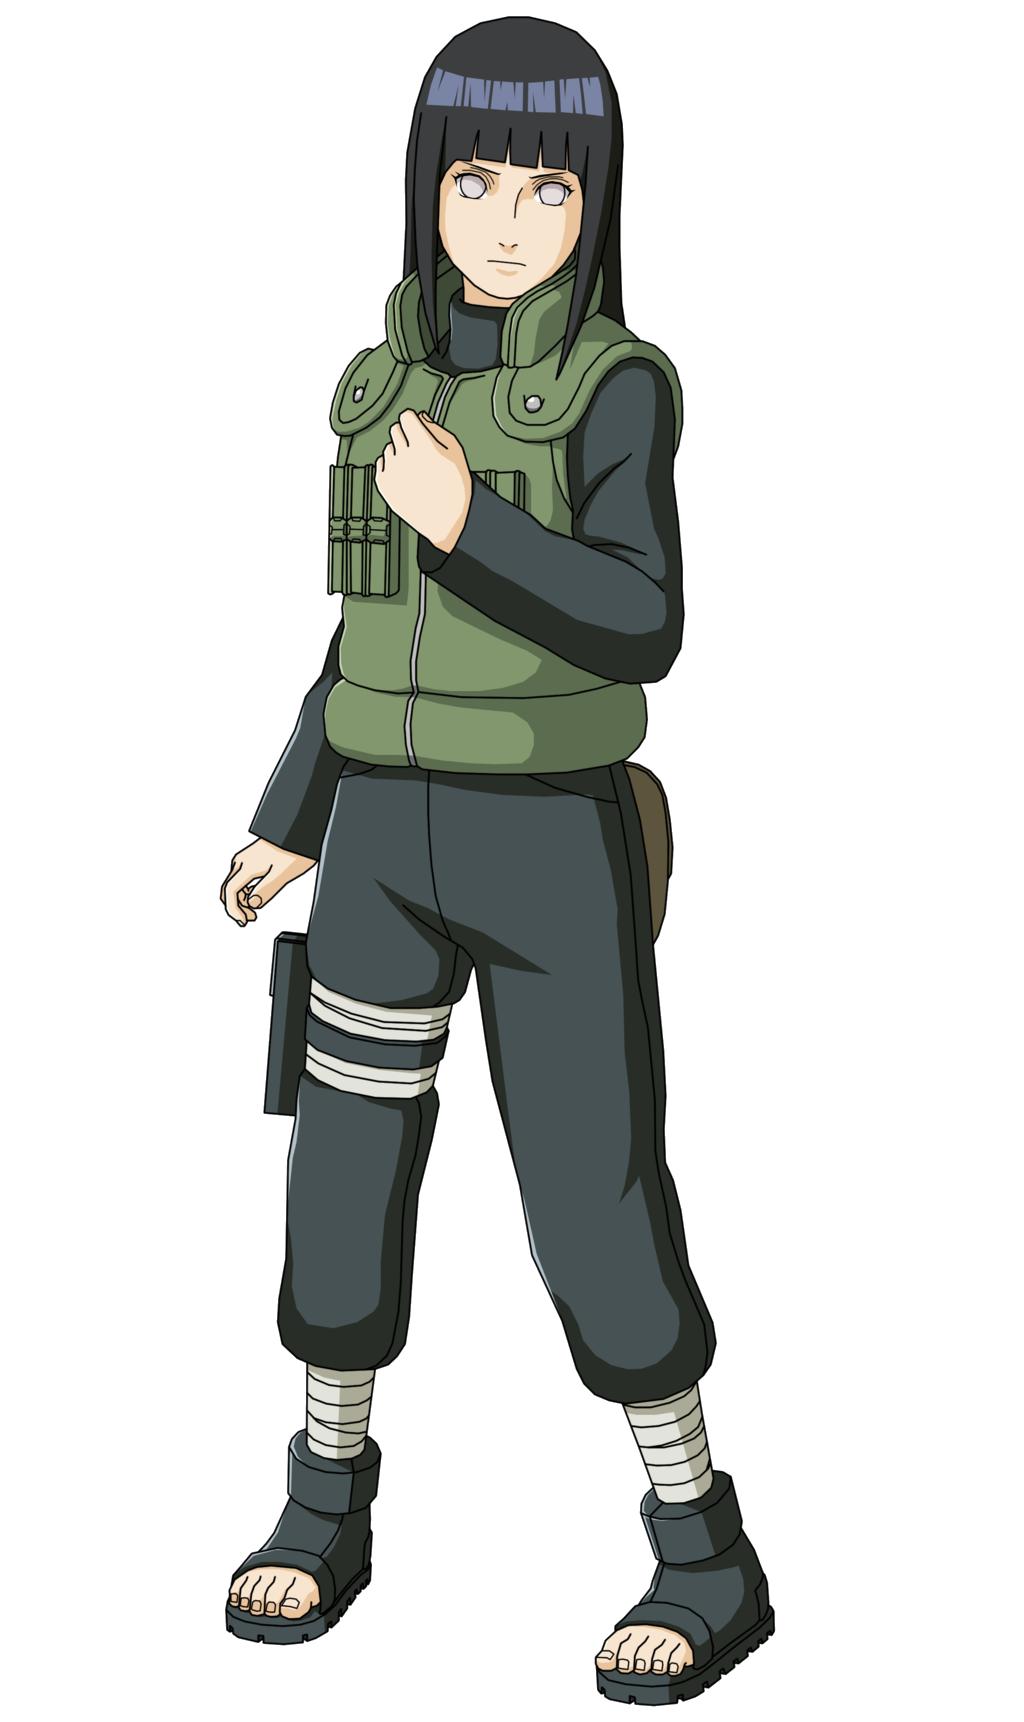 Hinata_Hy%C5%ABga_-_Allied_Shinobi_Forces.png